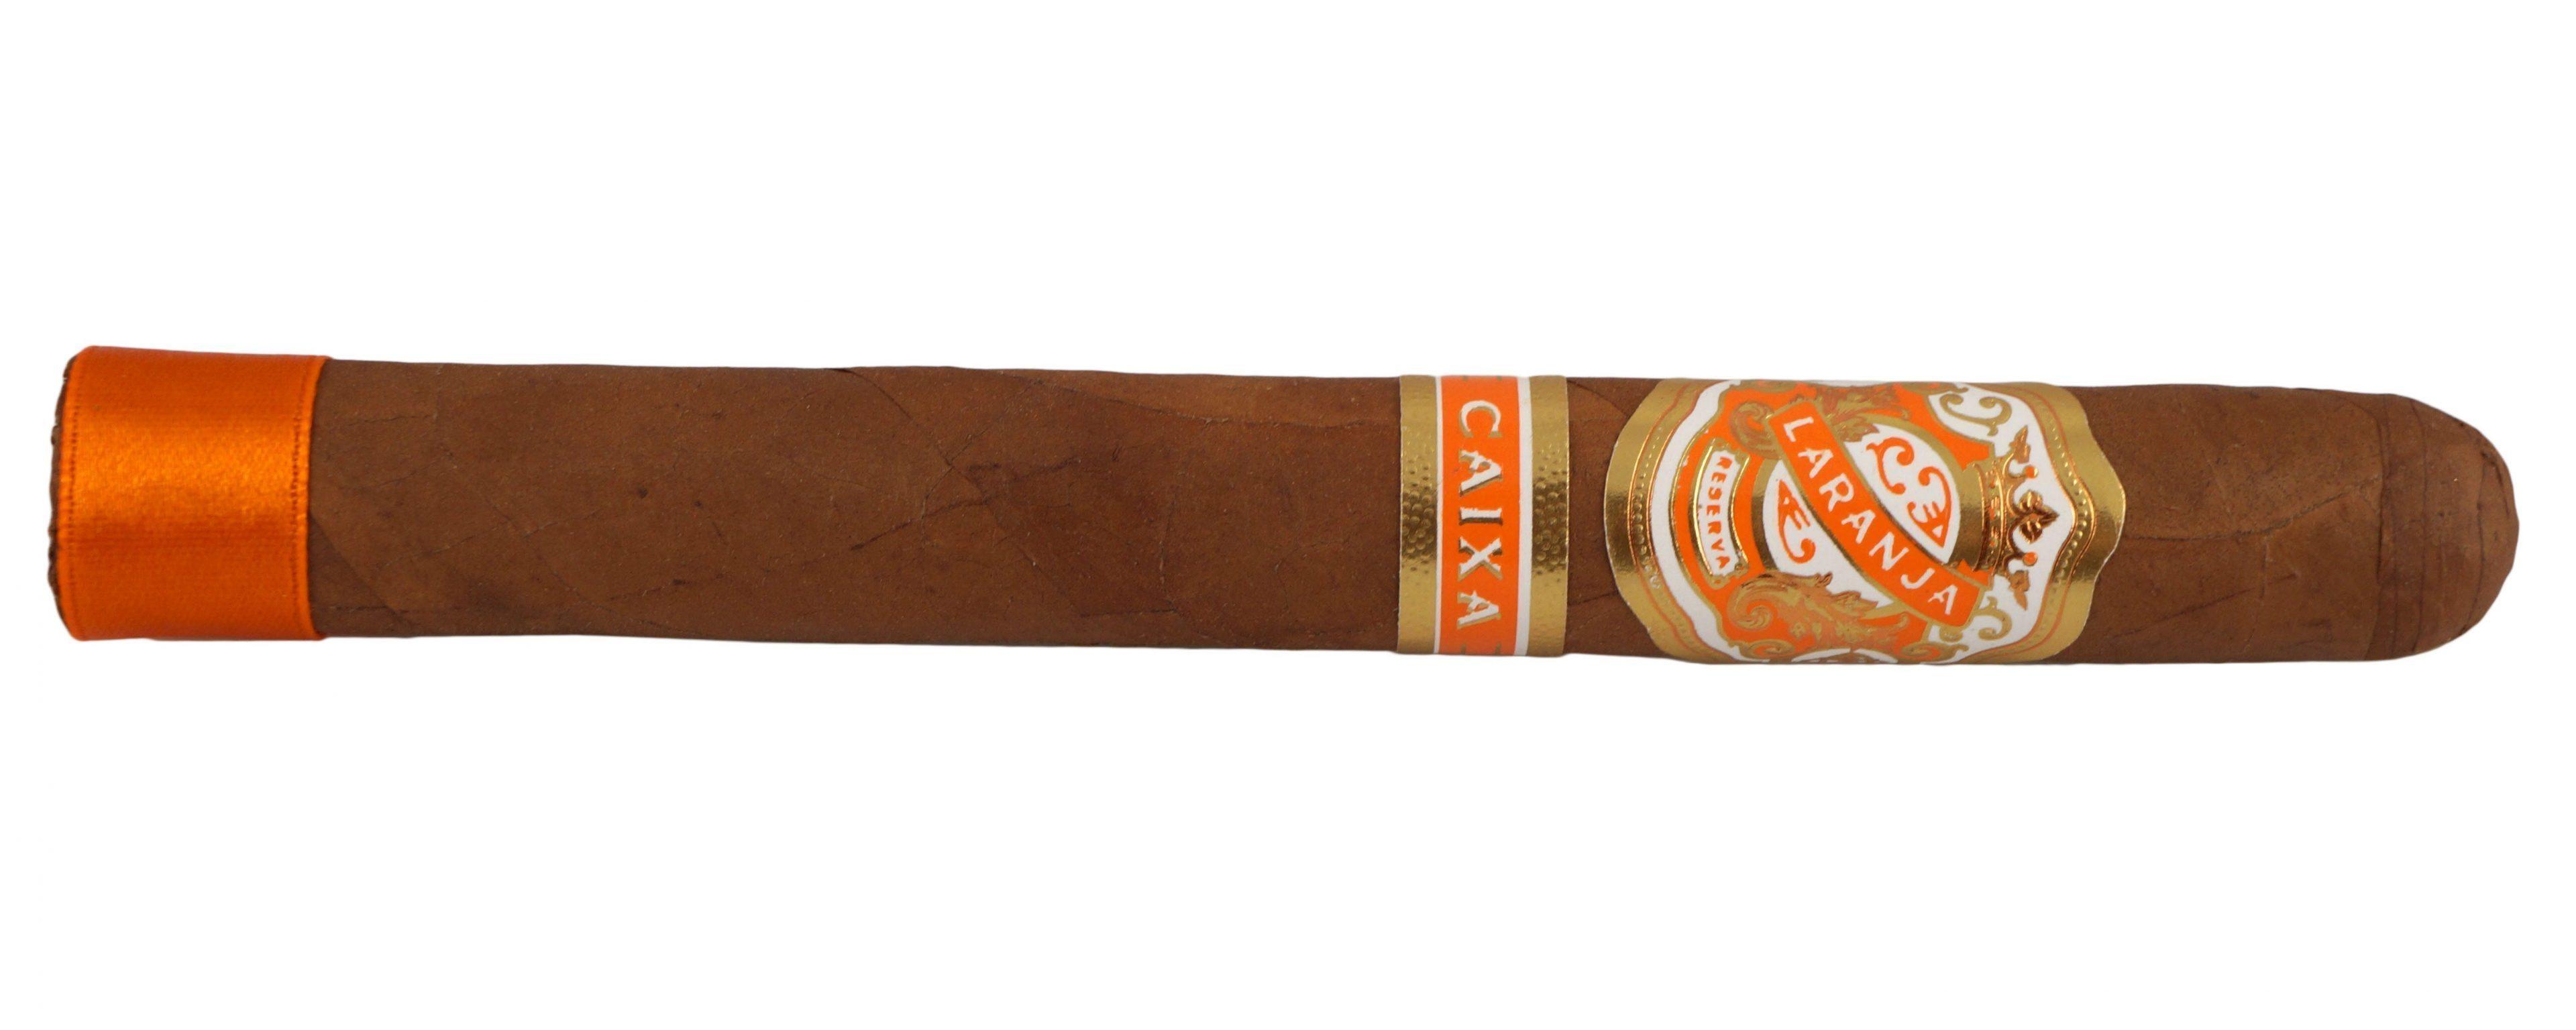 Blind Cigar Review: Espinosa | Laranja Reserva Caixa